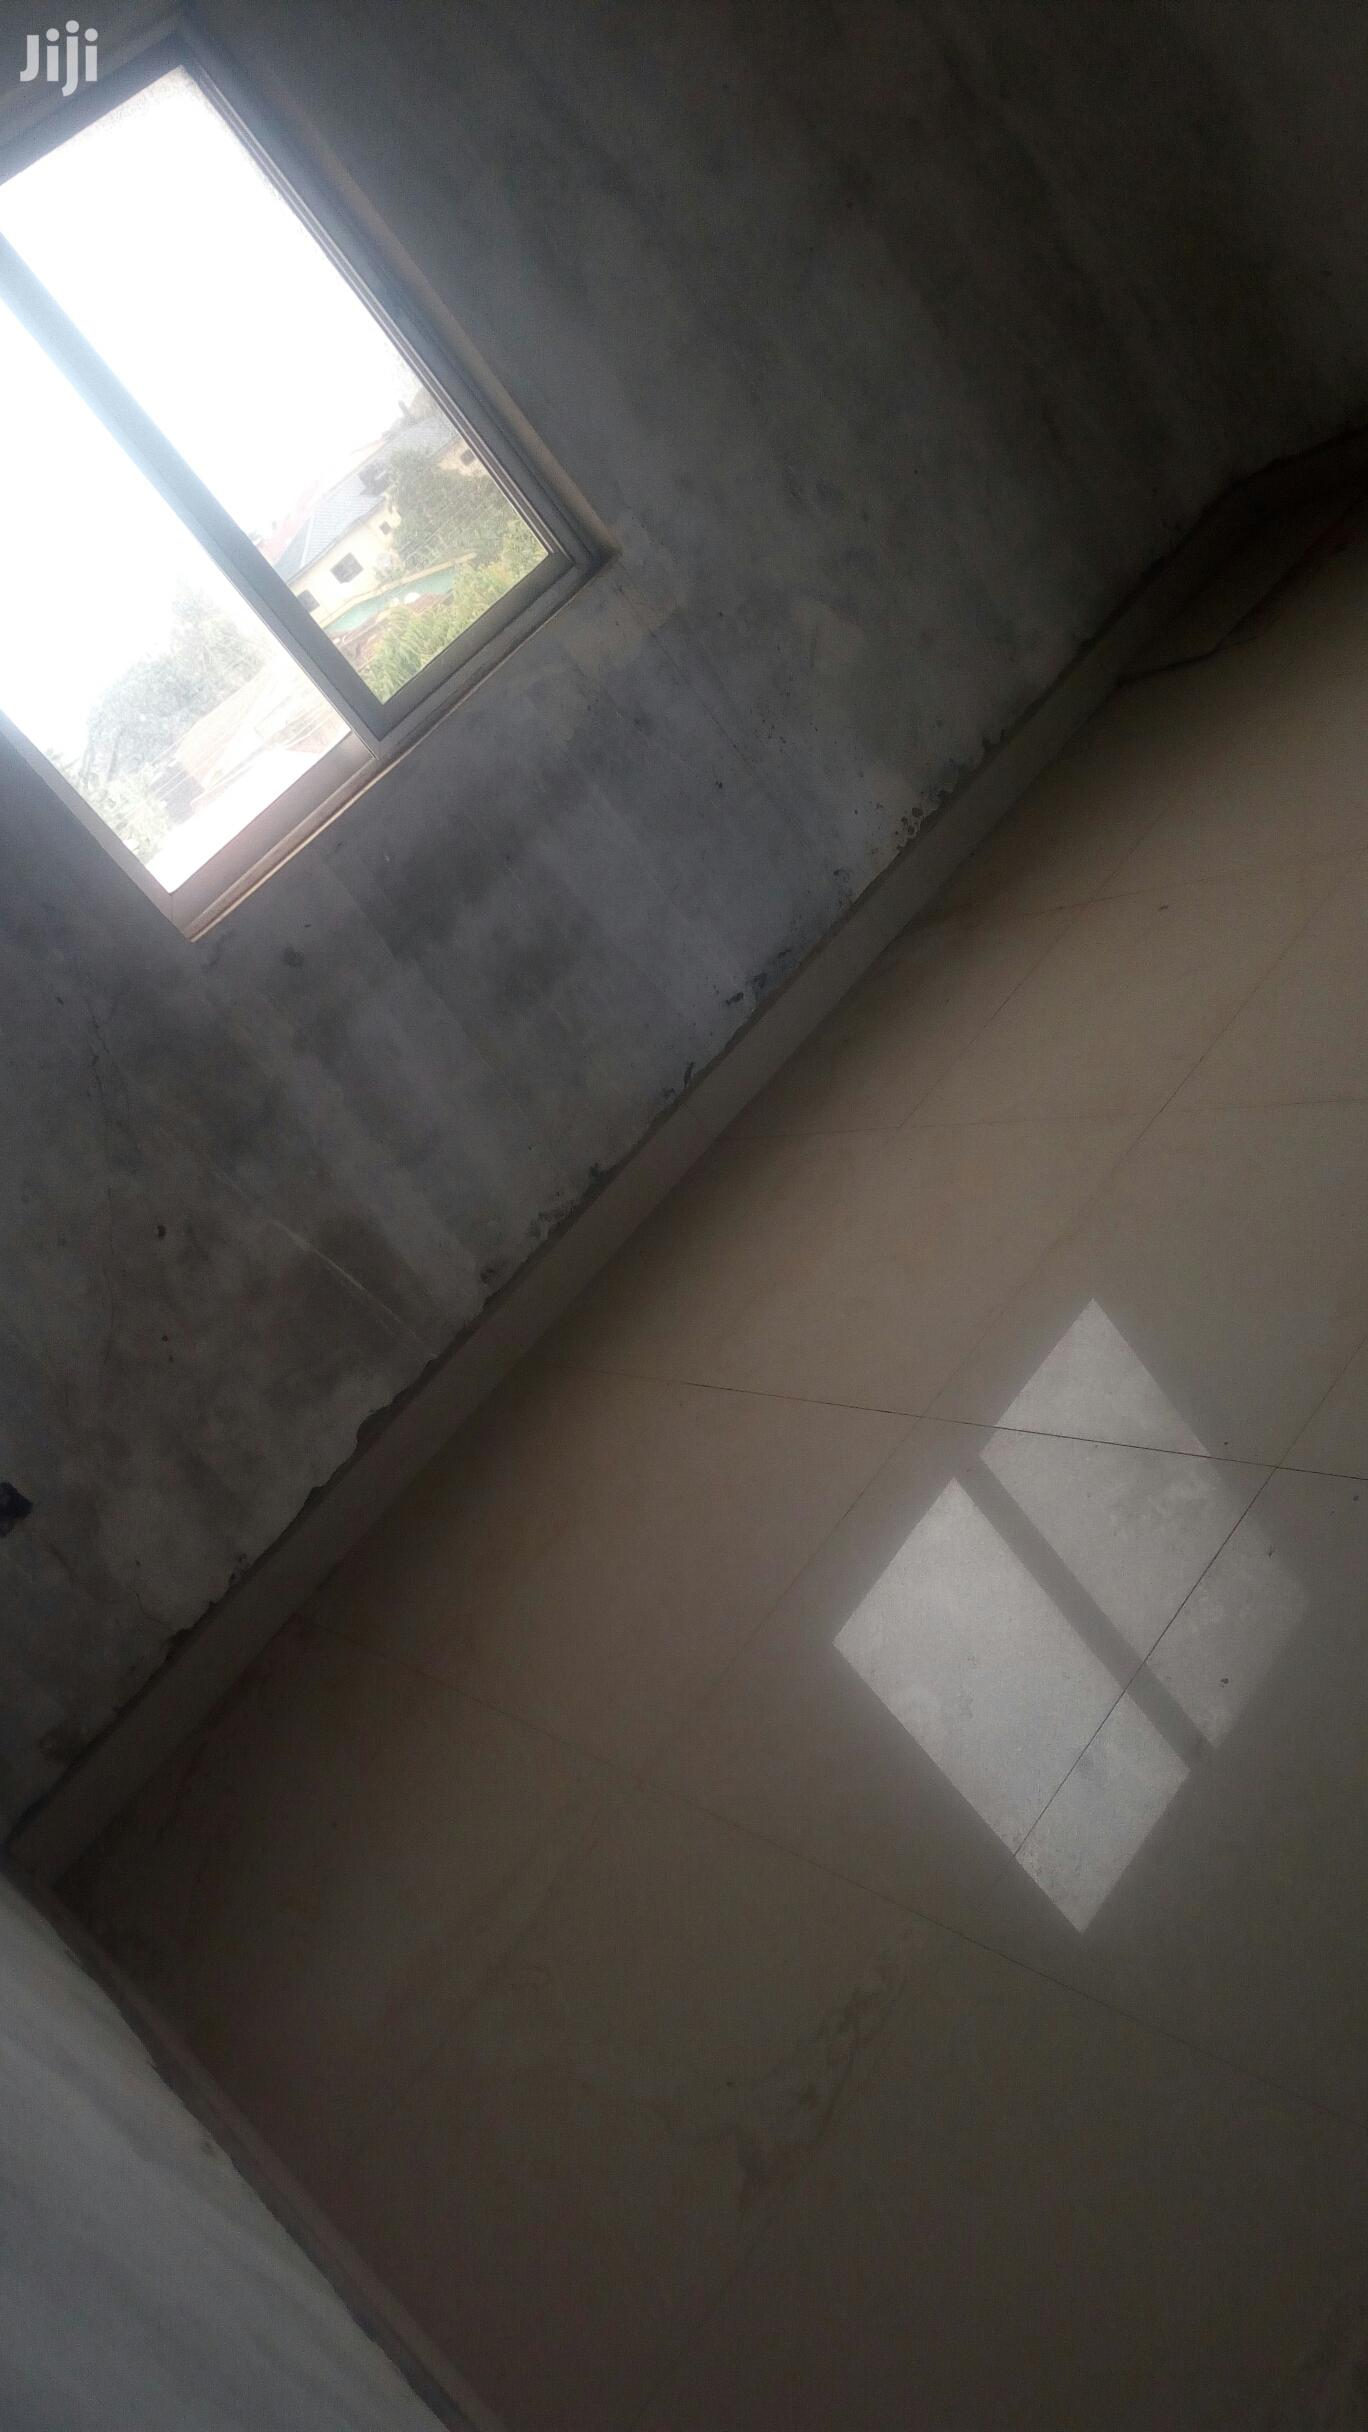 2 Bedroom House In Kasoa For Rent | Houses & Apartments For Rent for sale in Awutu Senya East Municipal, Central Region, Ghana